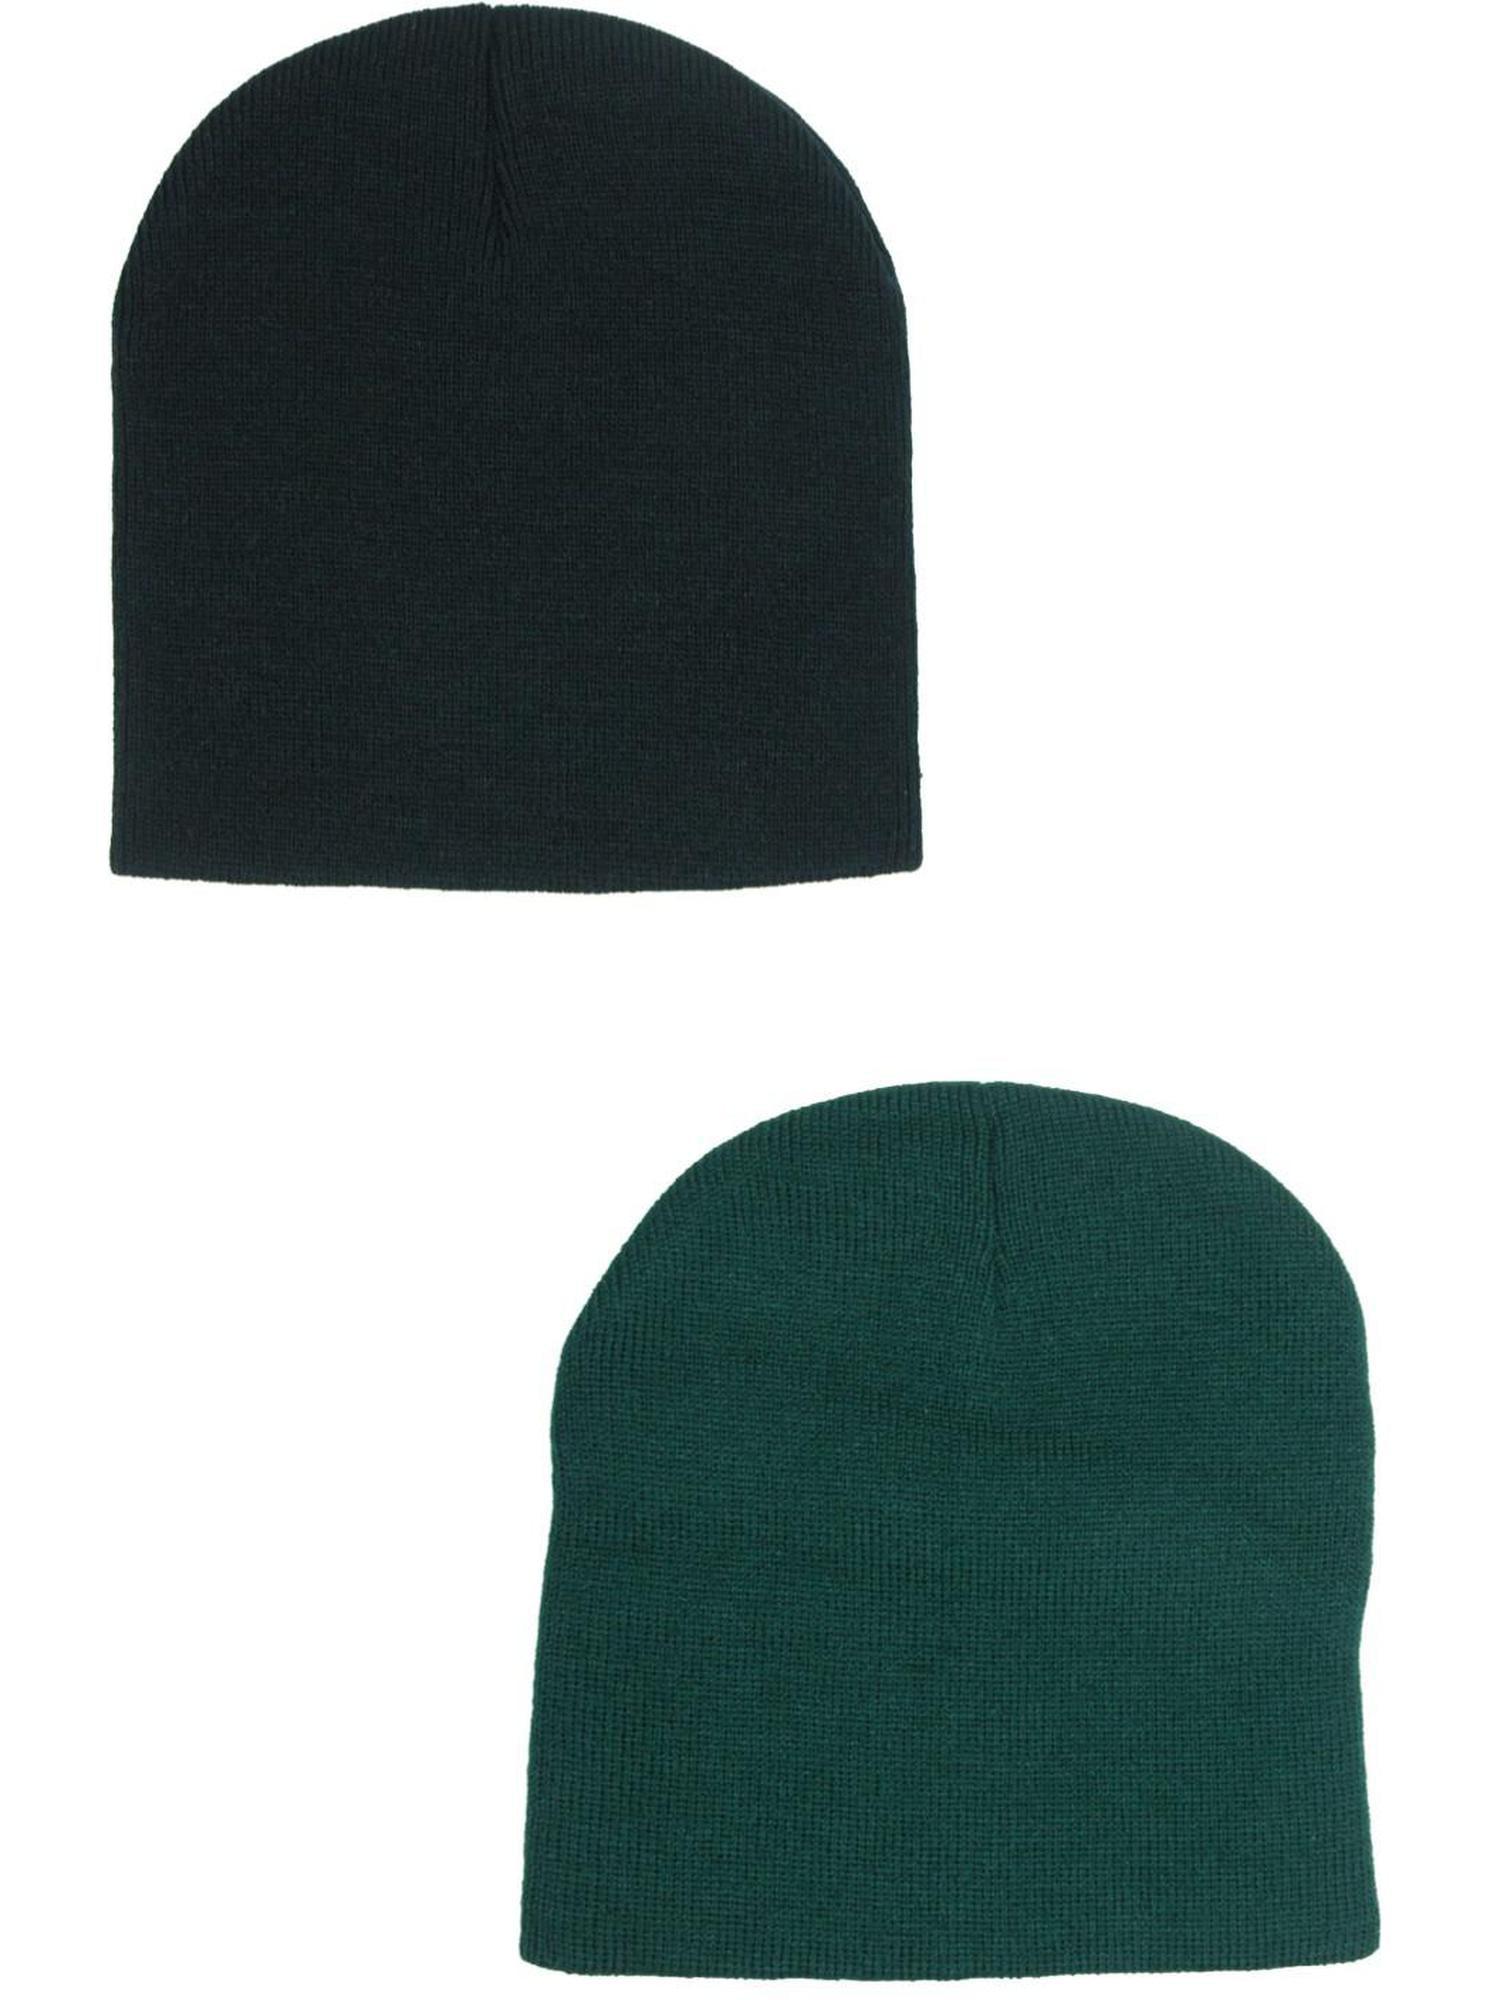 3M Thinsulate Lined Acrylic Beanie BlackGrey Stretch Fit Winter Warm Hat Cap Ski